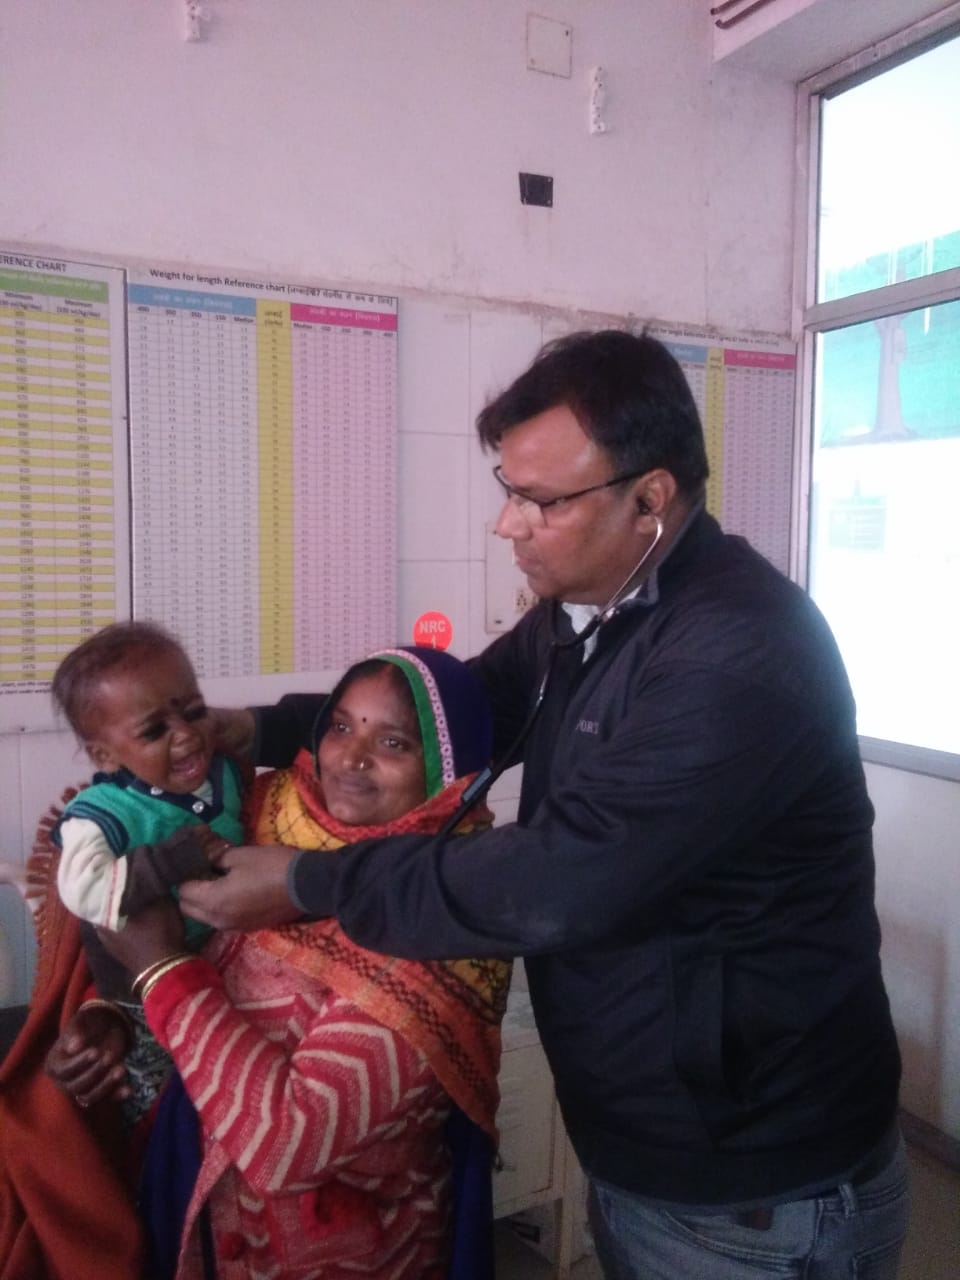 हिंदी समाचार |कुपोषित बच्चे को स्वास्थ्य...